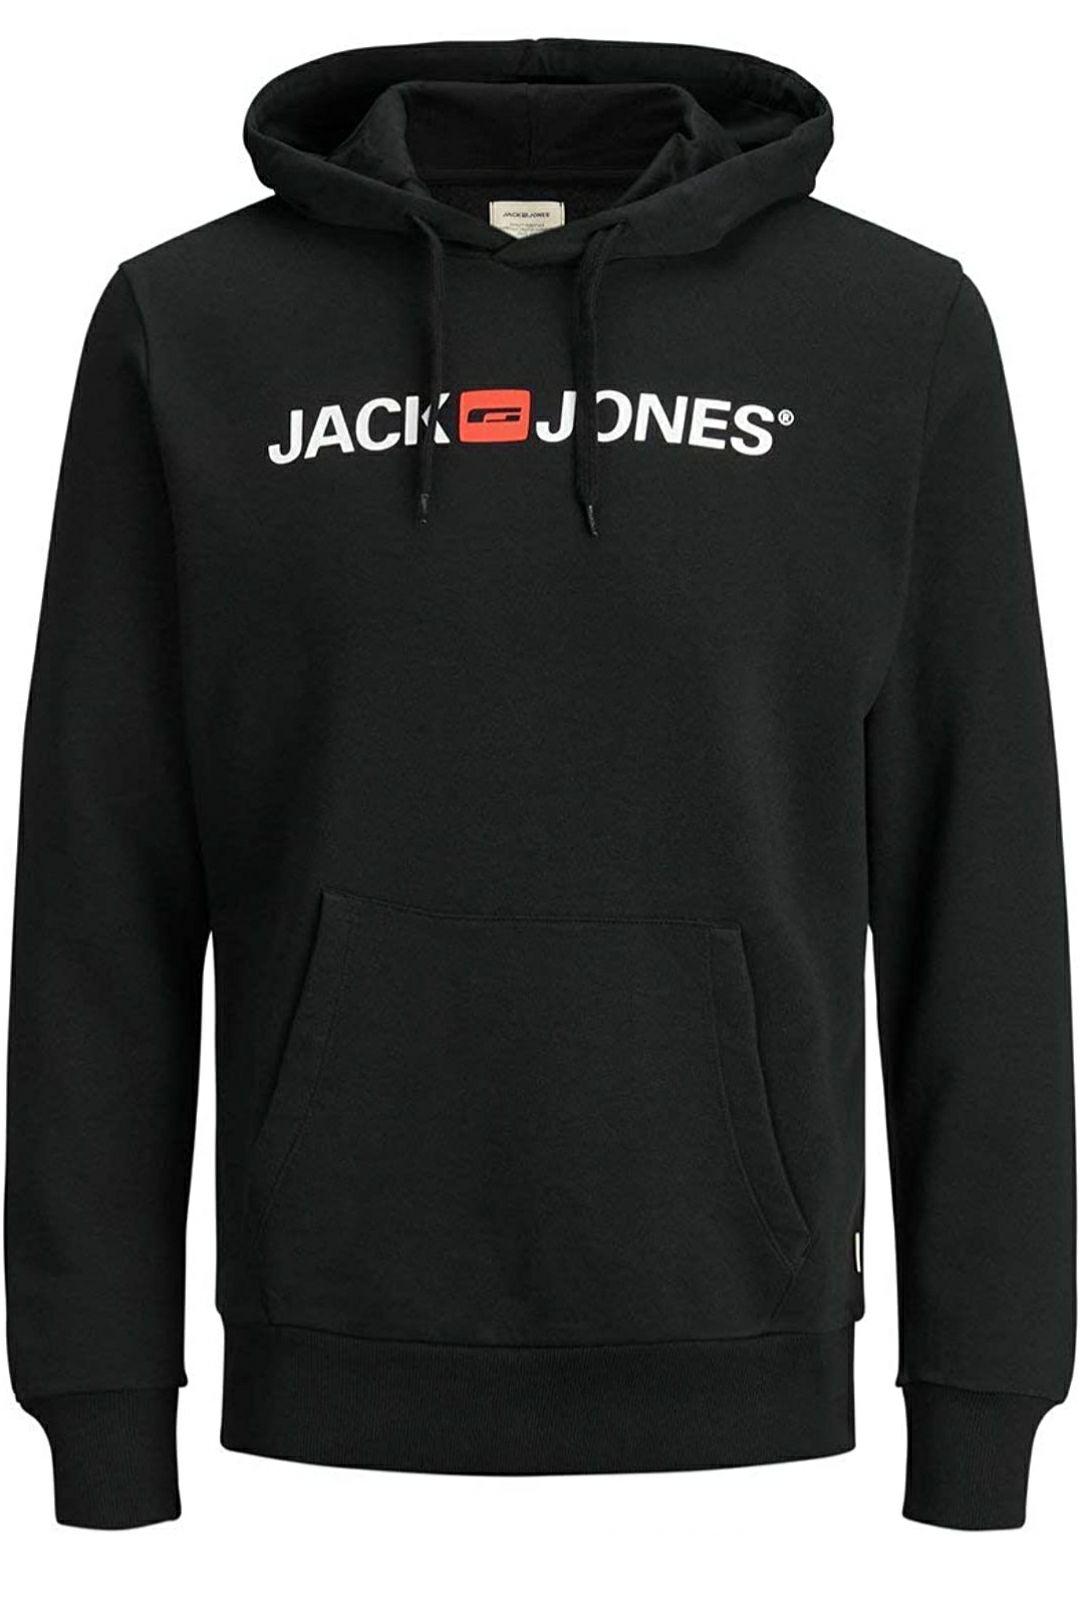 Sudadera con capucha Jack & Jones negra o gris